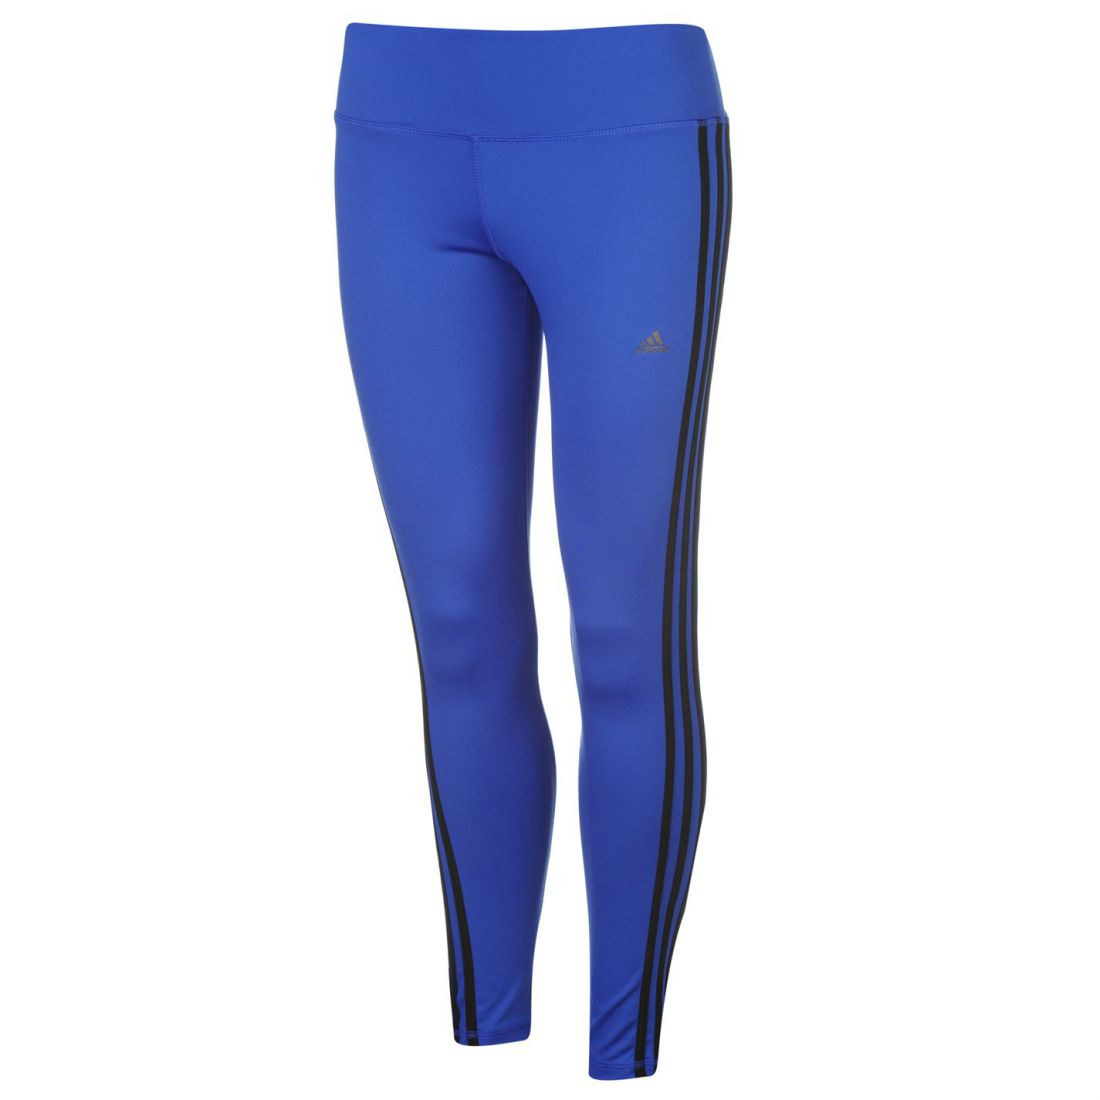 13679882100a0 adidas Womens 3S Long Tight Ladies Elastic Sports Pants Training ...